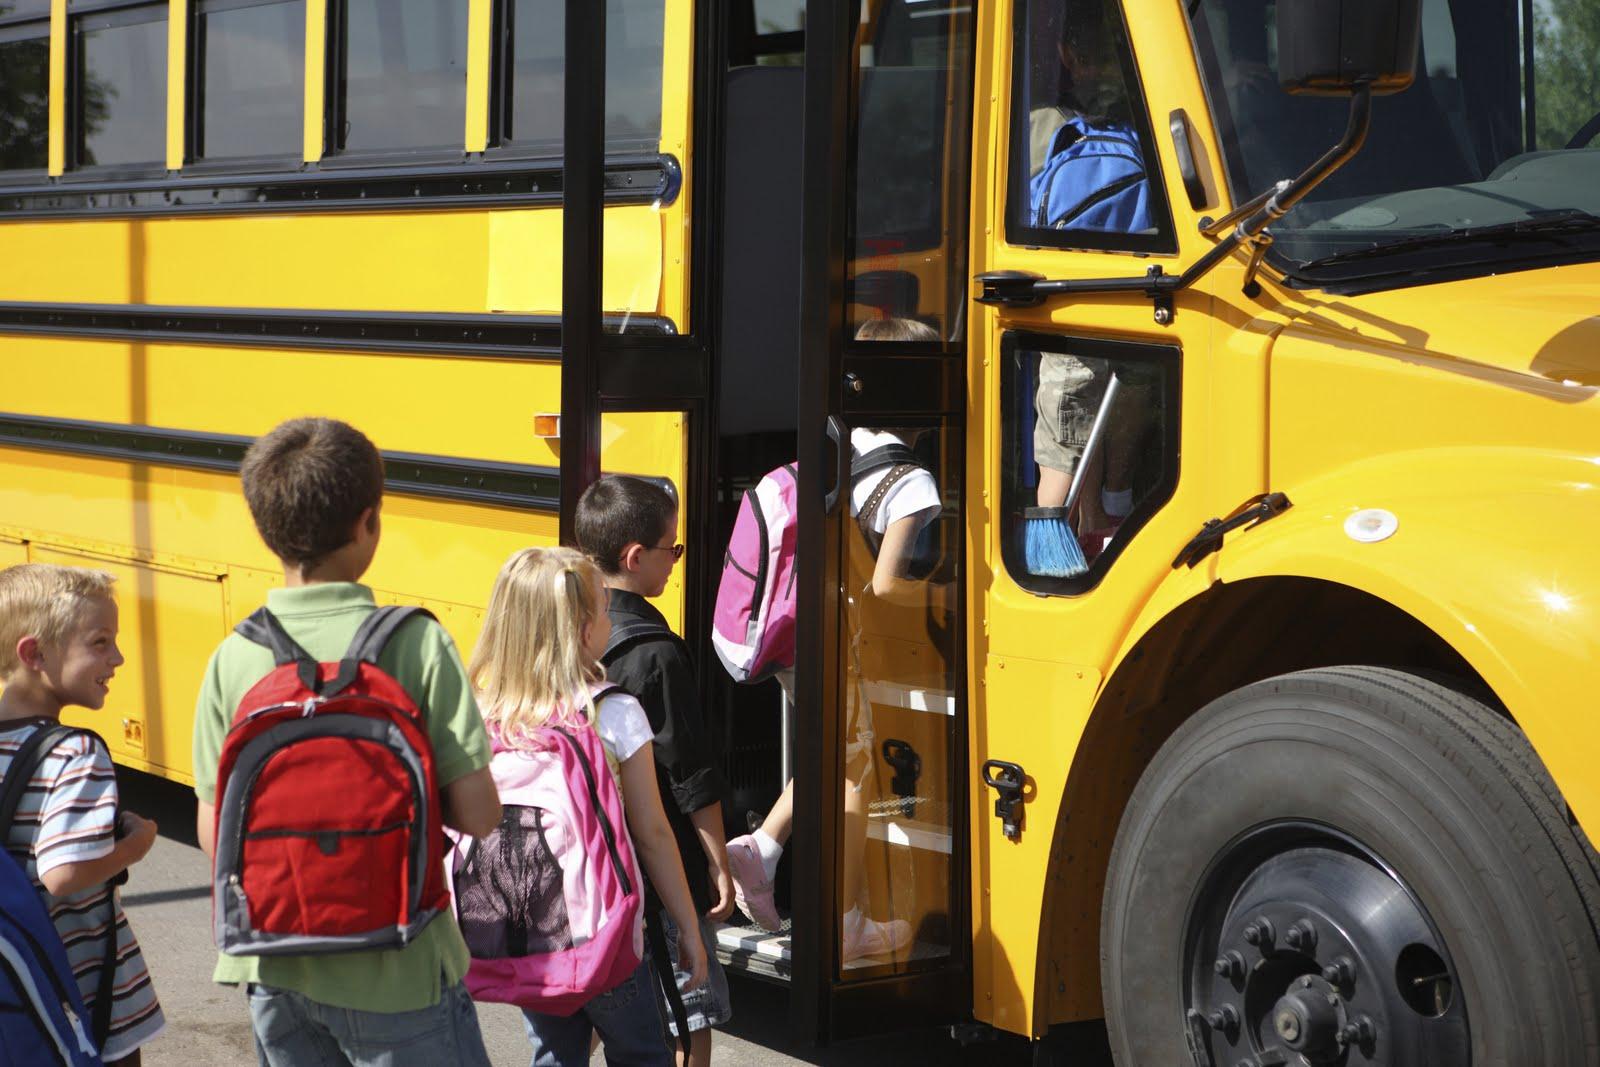 school%2Bbus WATCH4BEAUTY EROTIC NUDE MAGAZINE | AMAZING NAKED GIRLS   DAILY UPDATED ...